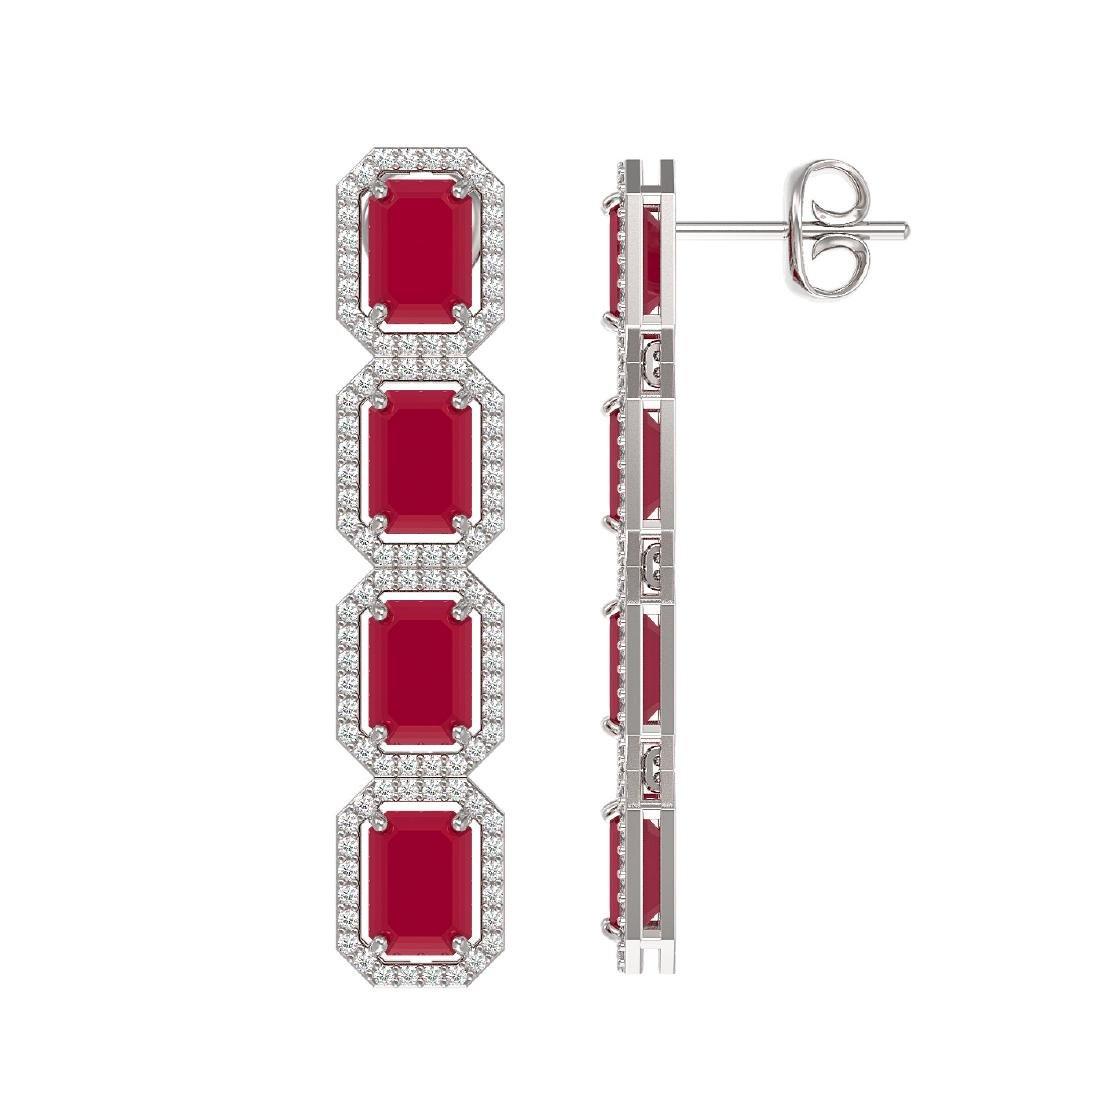 12.33 CTW Ruby & Diamond Halo Earrings 10K White Gold - 2